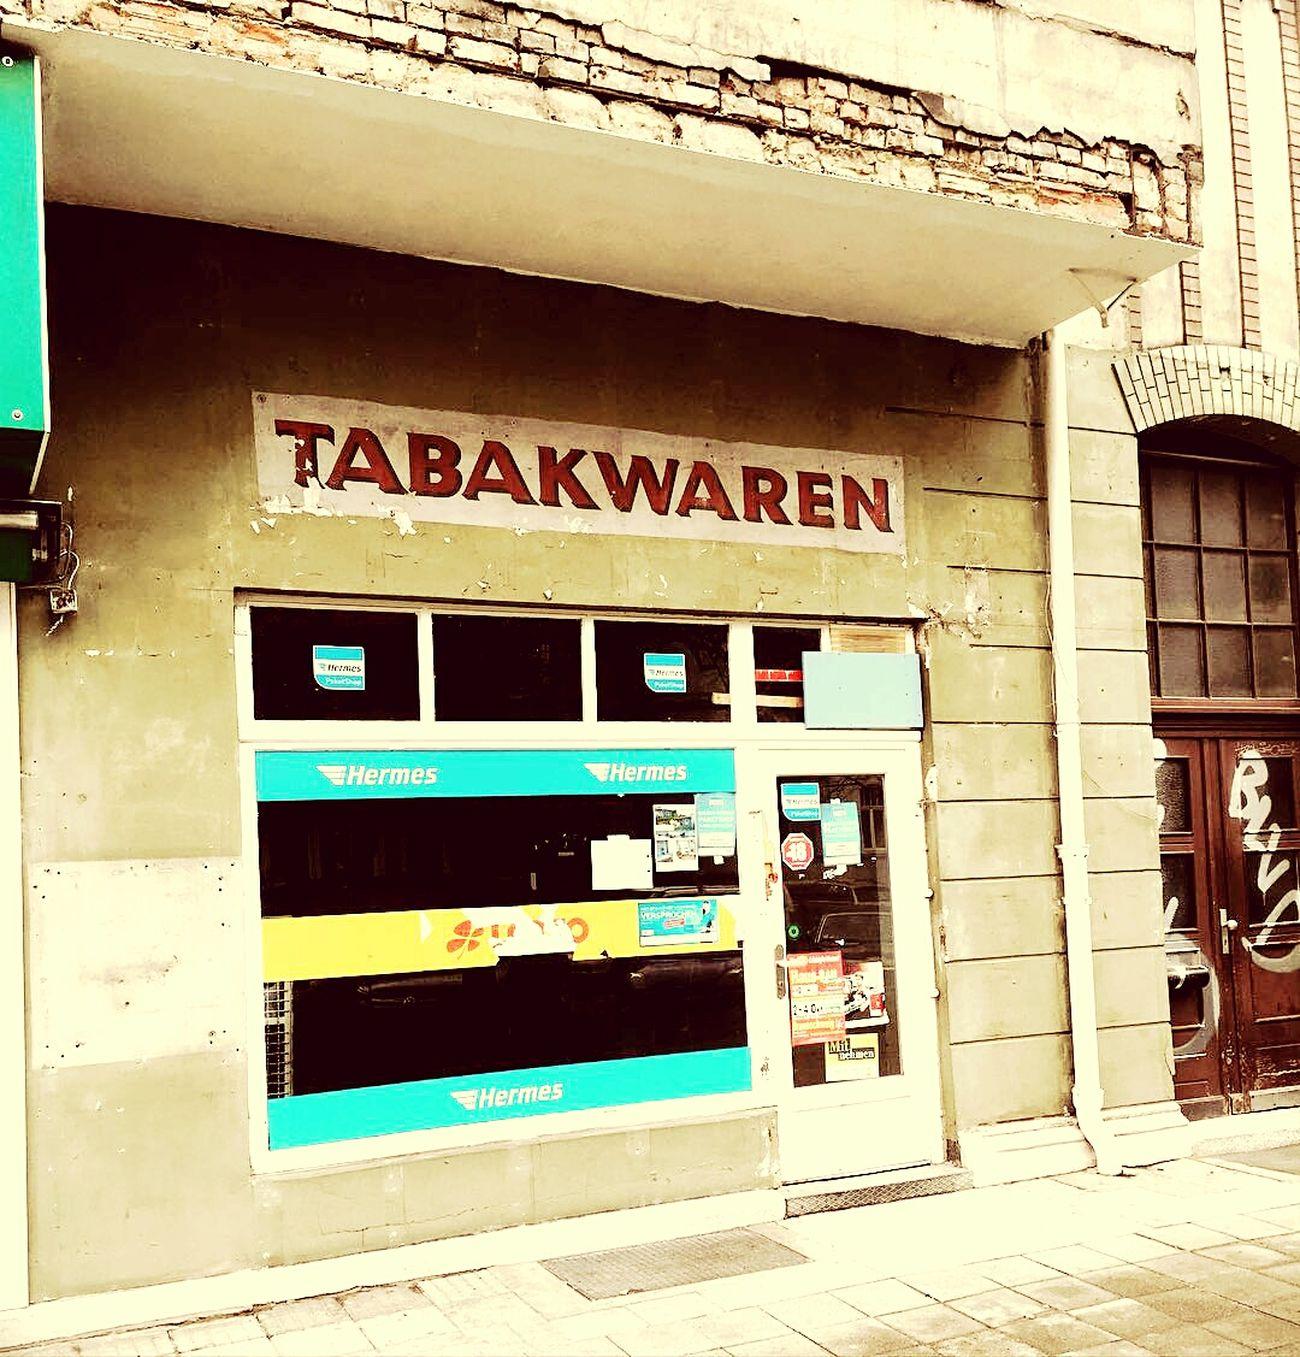 Discovering unseen layers of history Newsagent's Tobacco Shop Refurbishment Vintage Shop Kiosk Shop Sign Braunschweig Brunswick